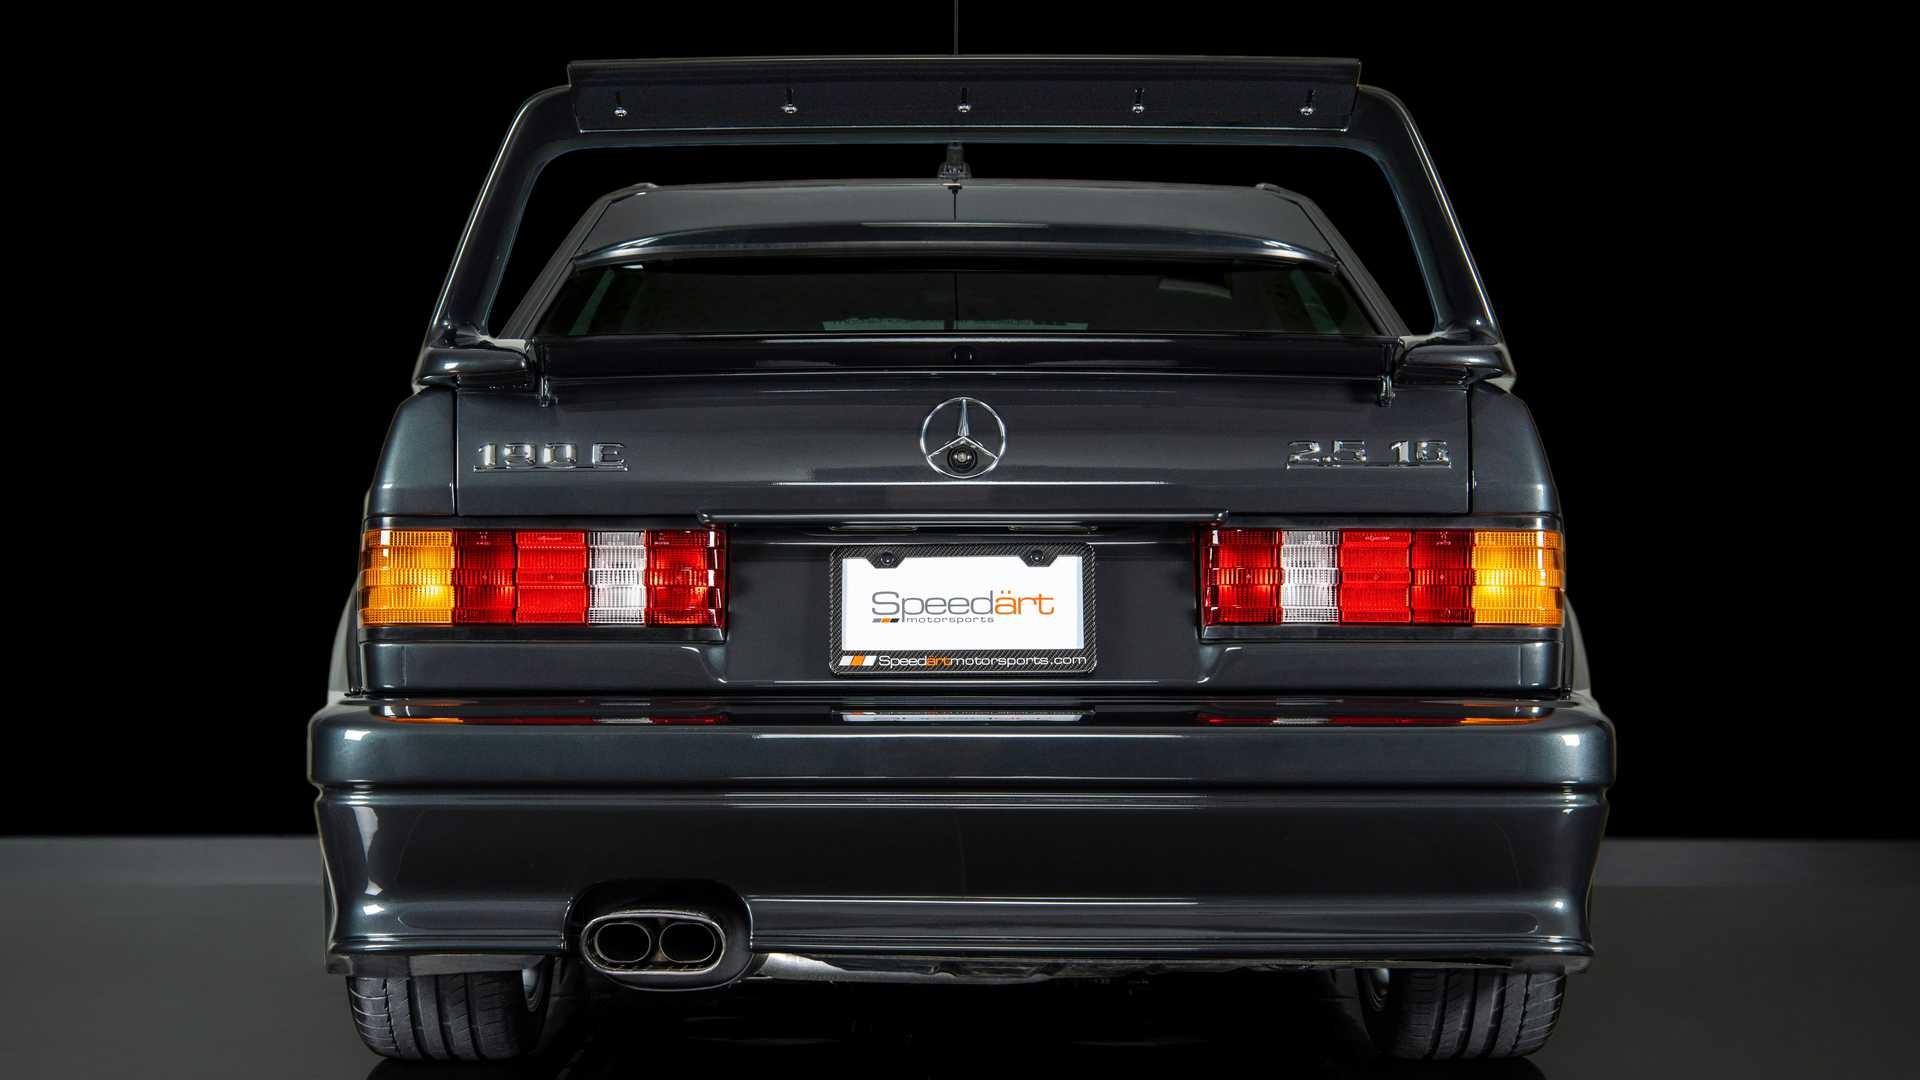 Шикарный Mercedes-Benz 190E 2.5-16 Evolution II 1990 года